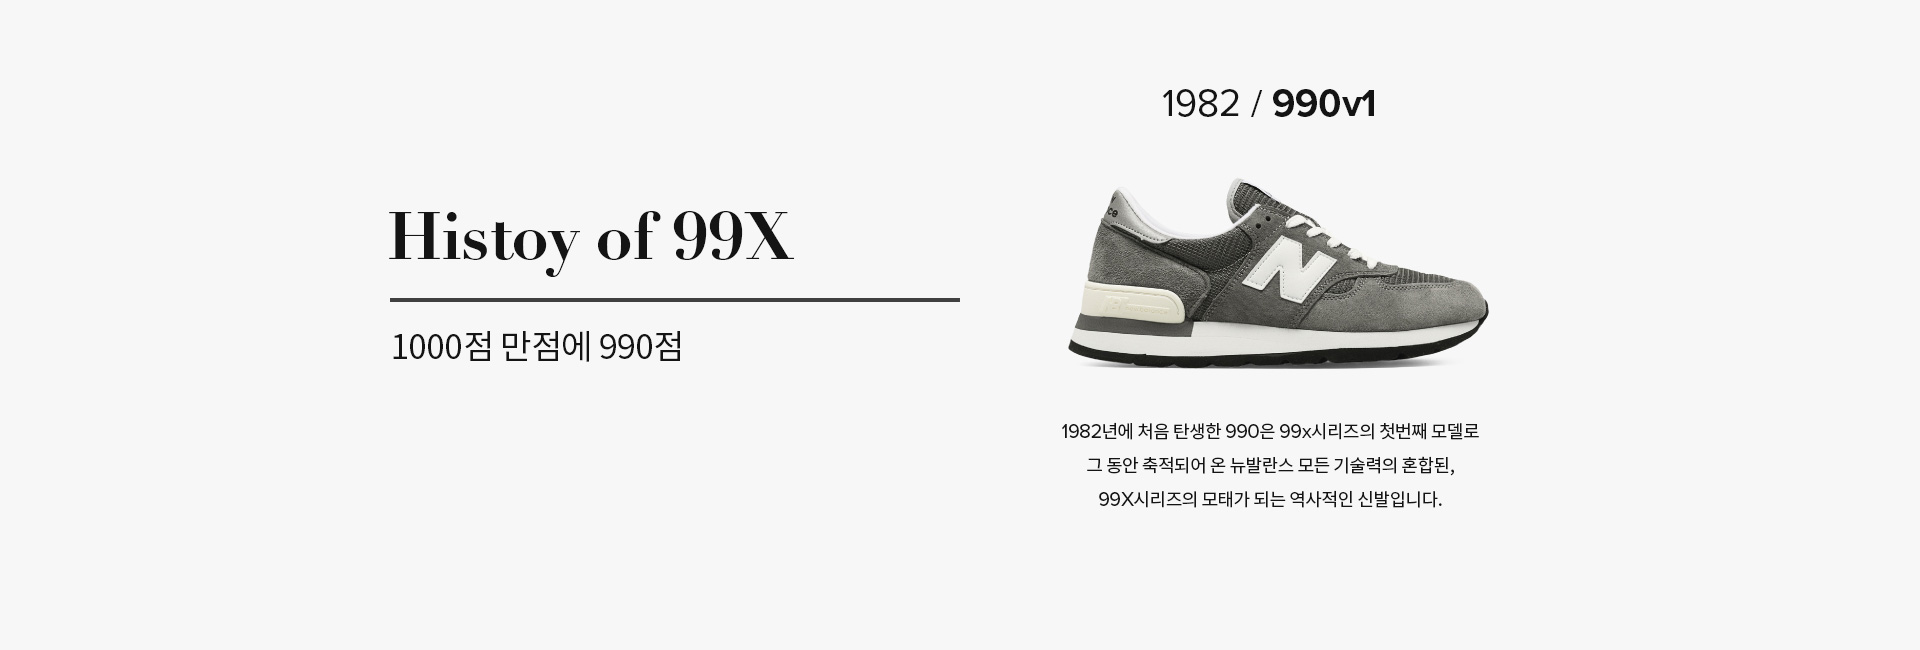 History of 99X